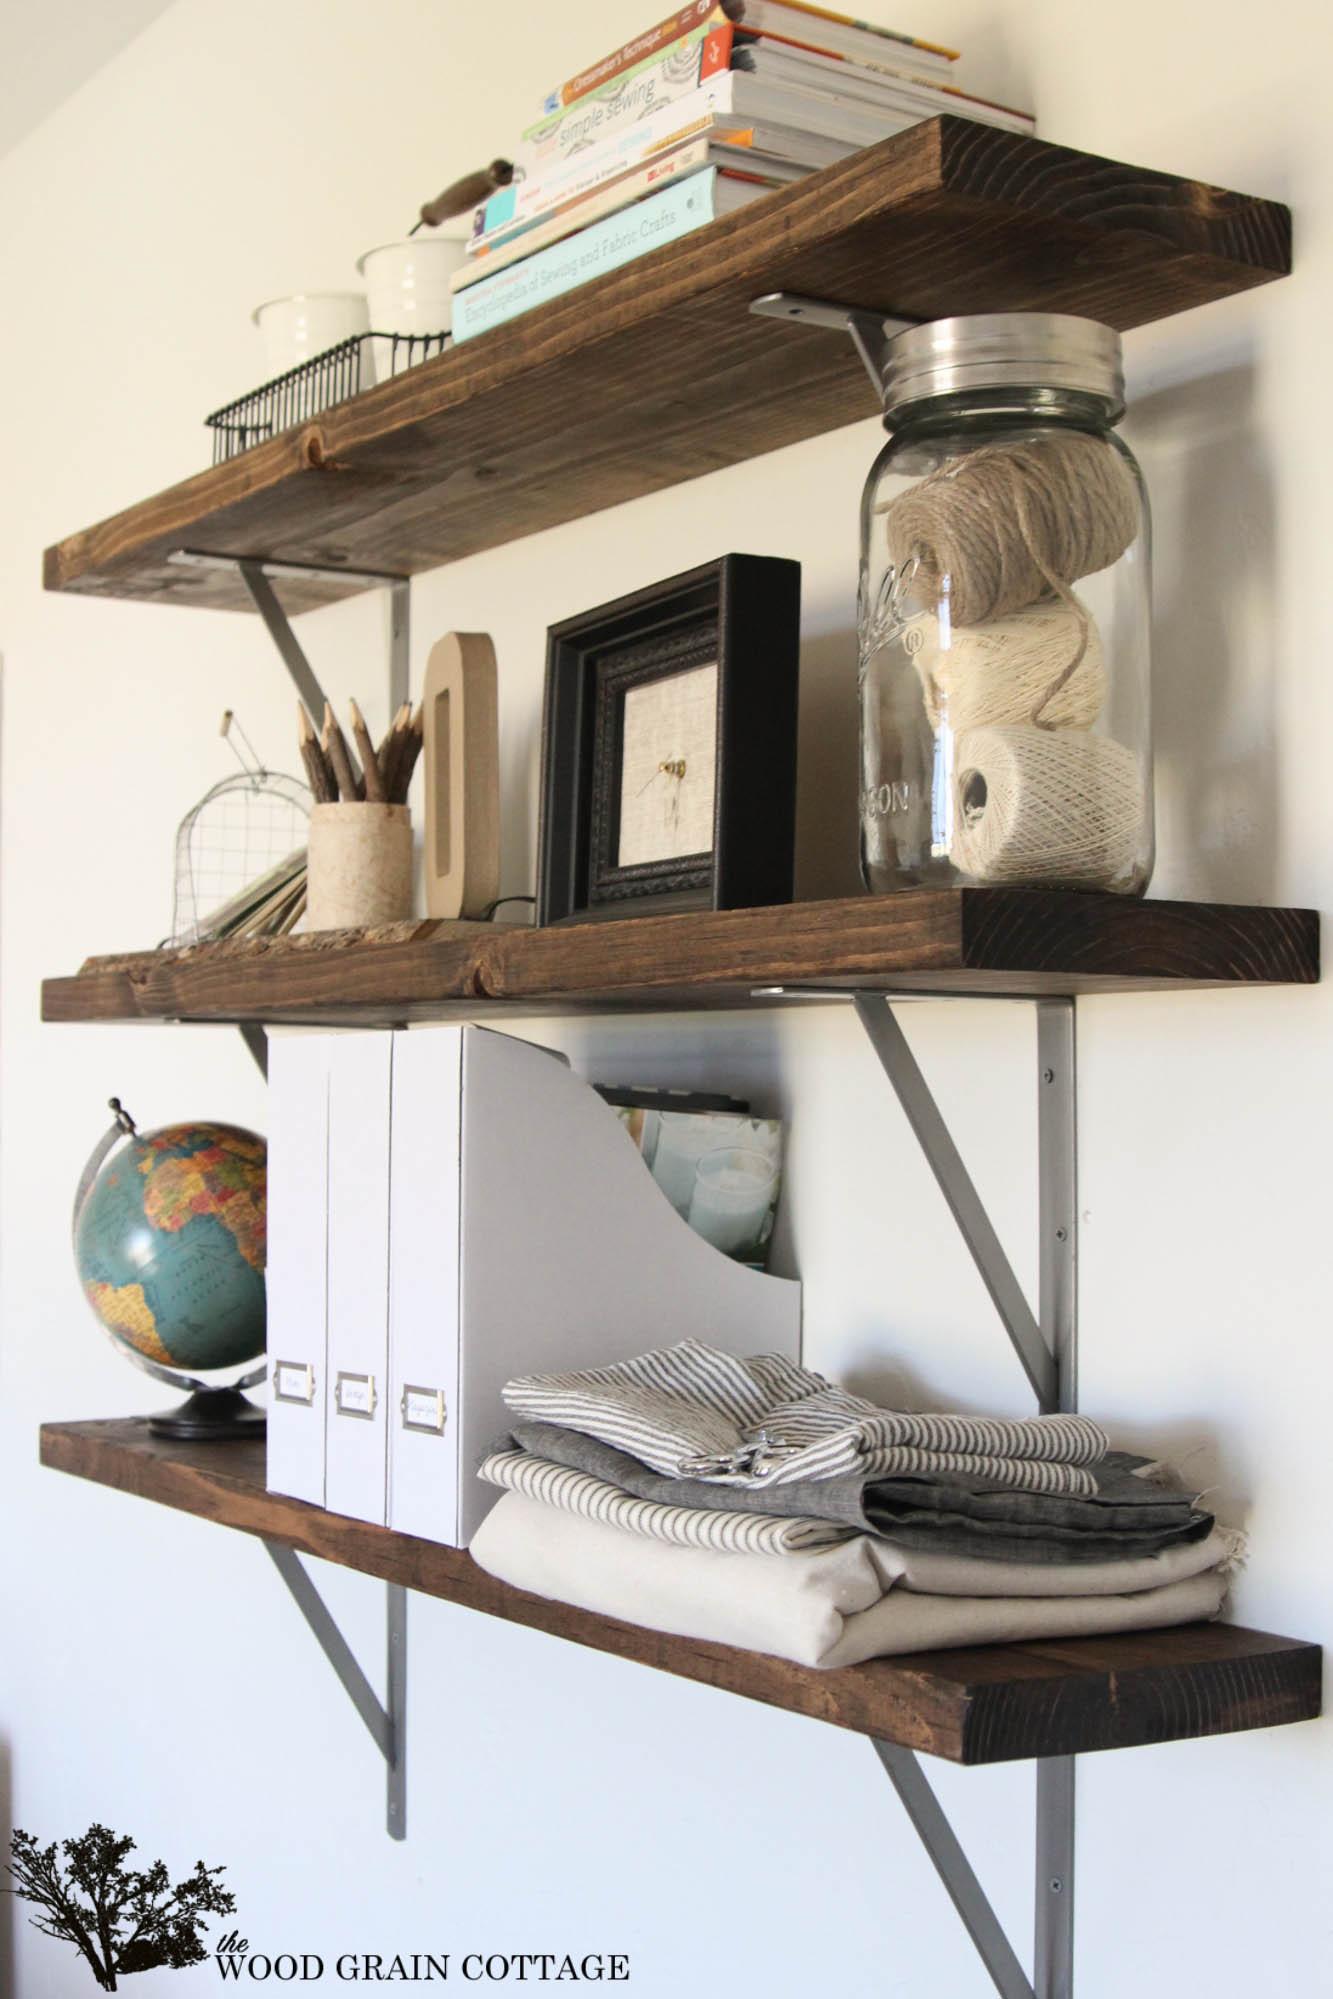 DIY Wood Storage Shelves  Farmhouse Flair Diy Wood Storage Shelf How To